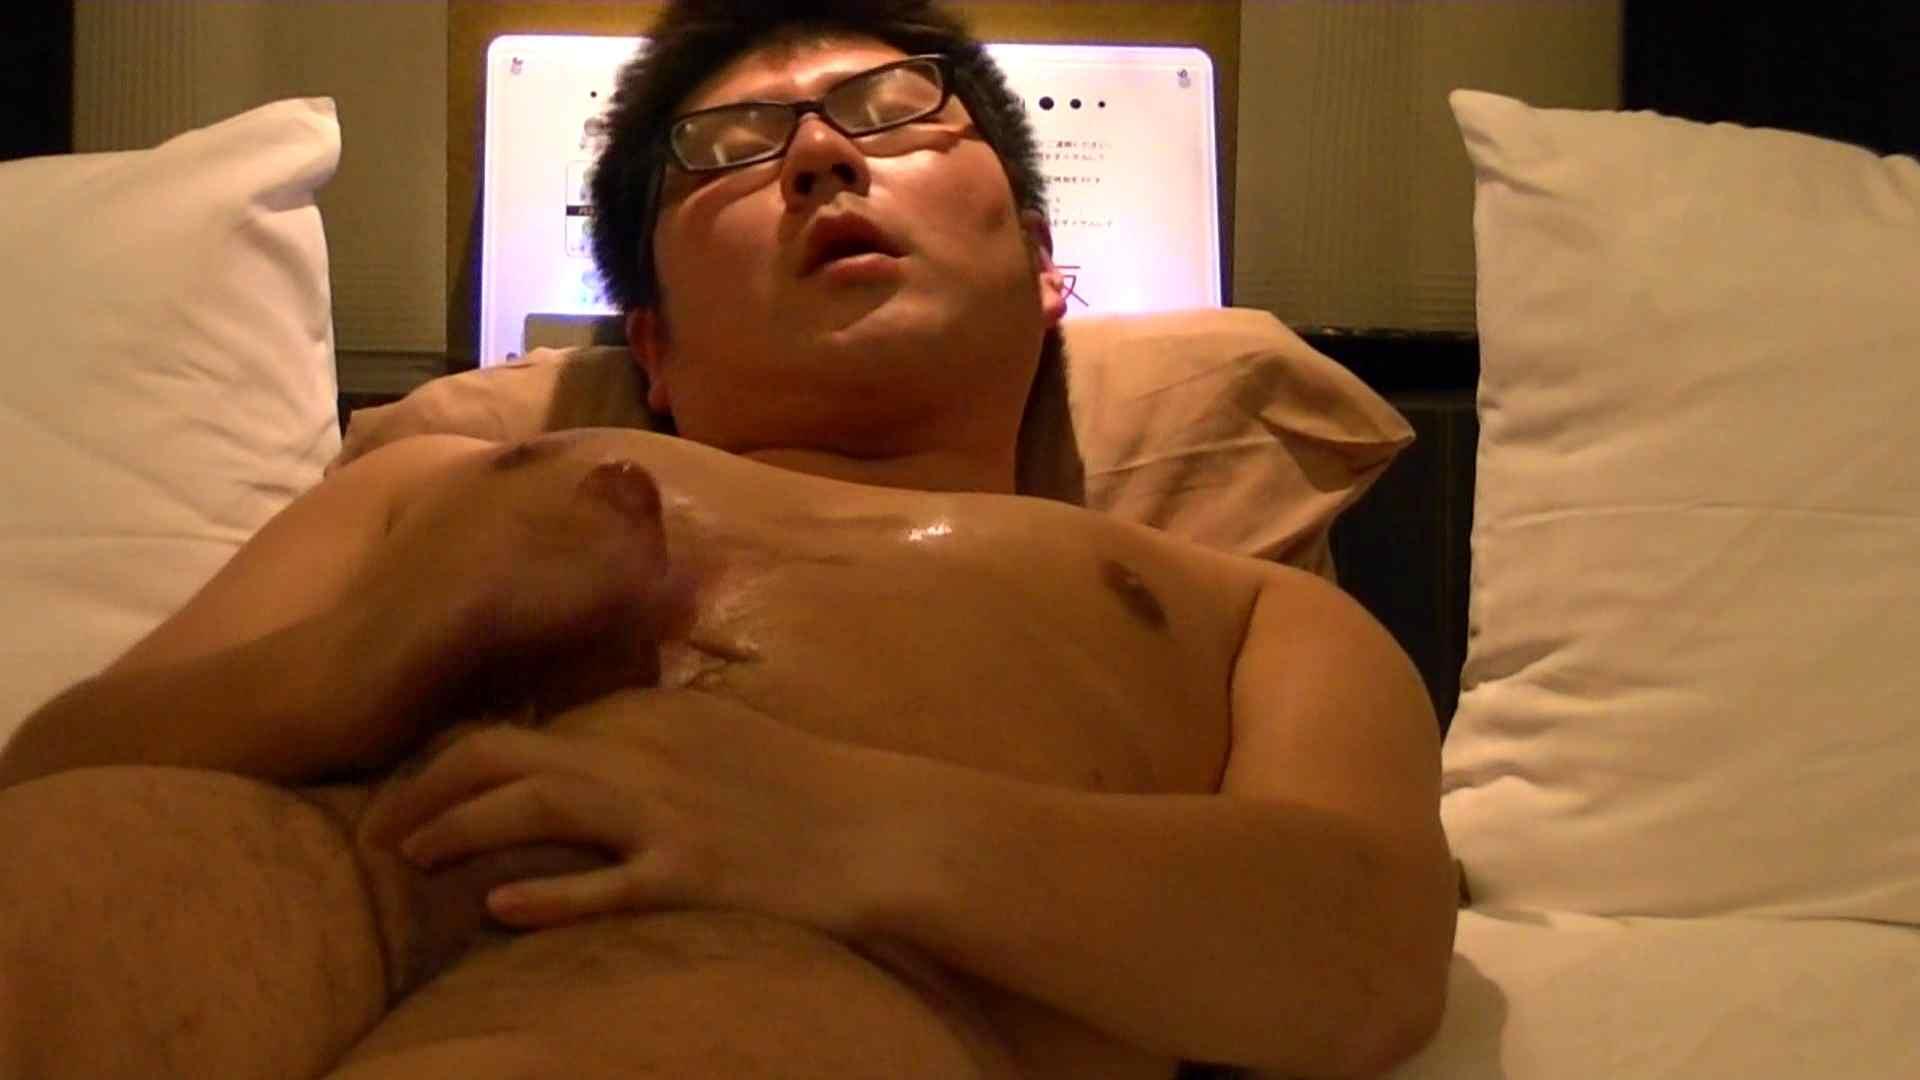 Mr.オナックスさん投稿!HD 貴方のオナニー三万円で撮影させてください。VOL.03 後編 完全無修正でお届け | オナニー特集  83pic 68